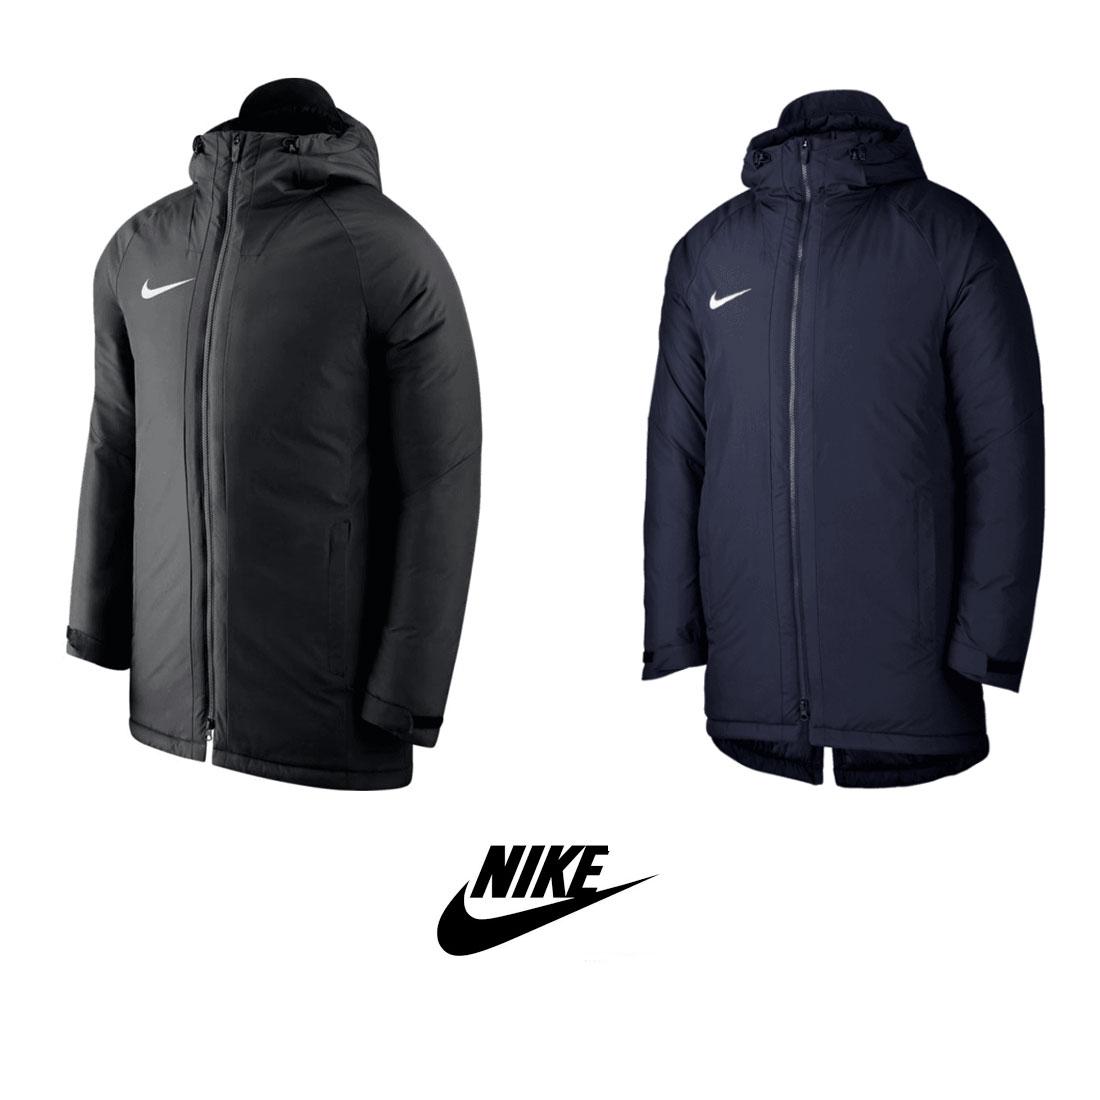 Nike Academy 18 jas met capuchon @ Geomix